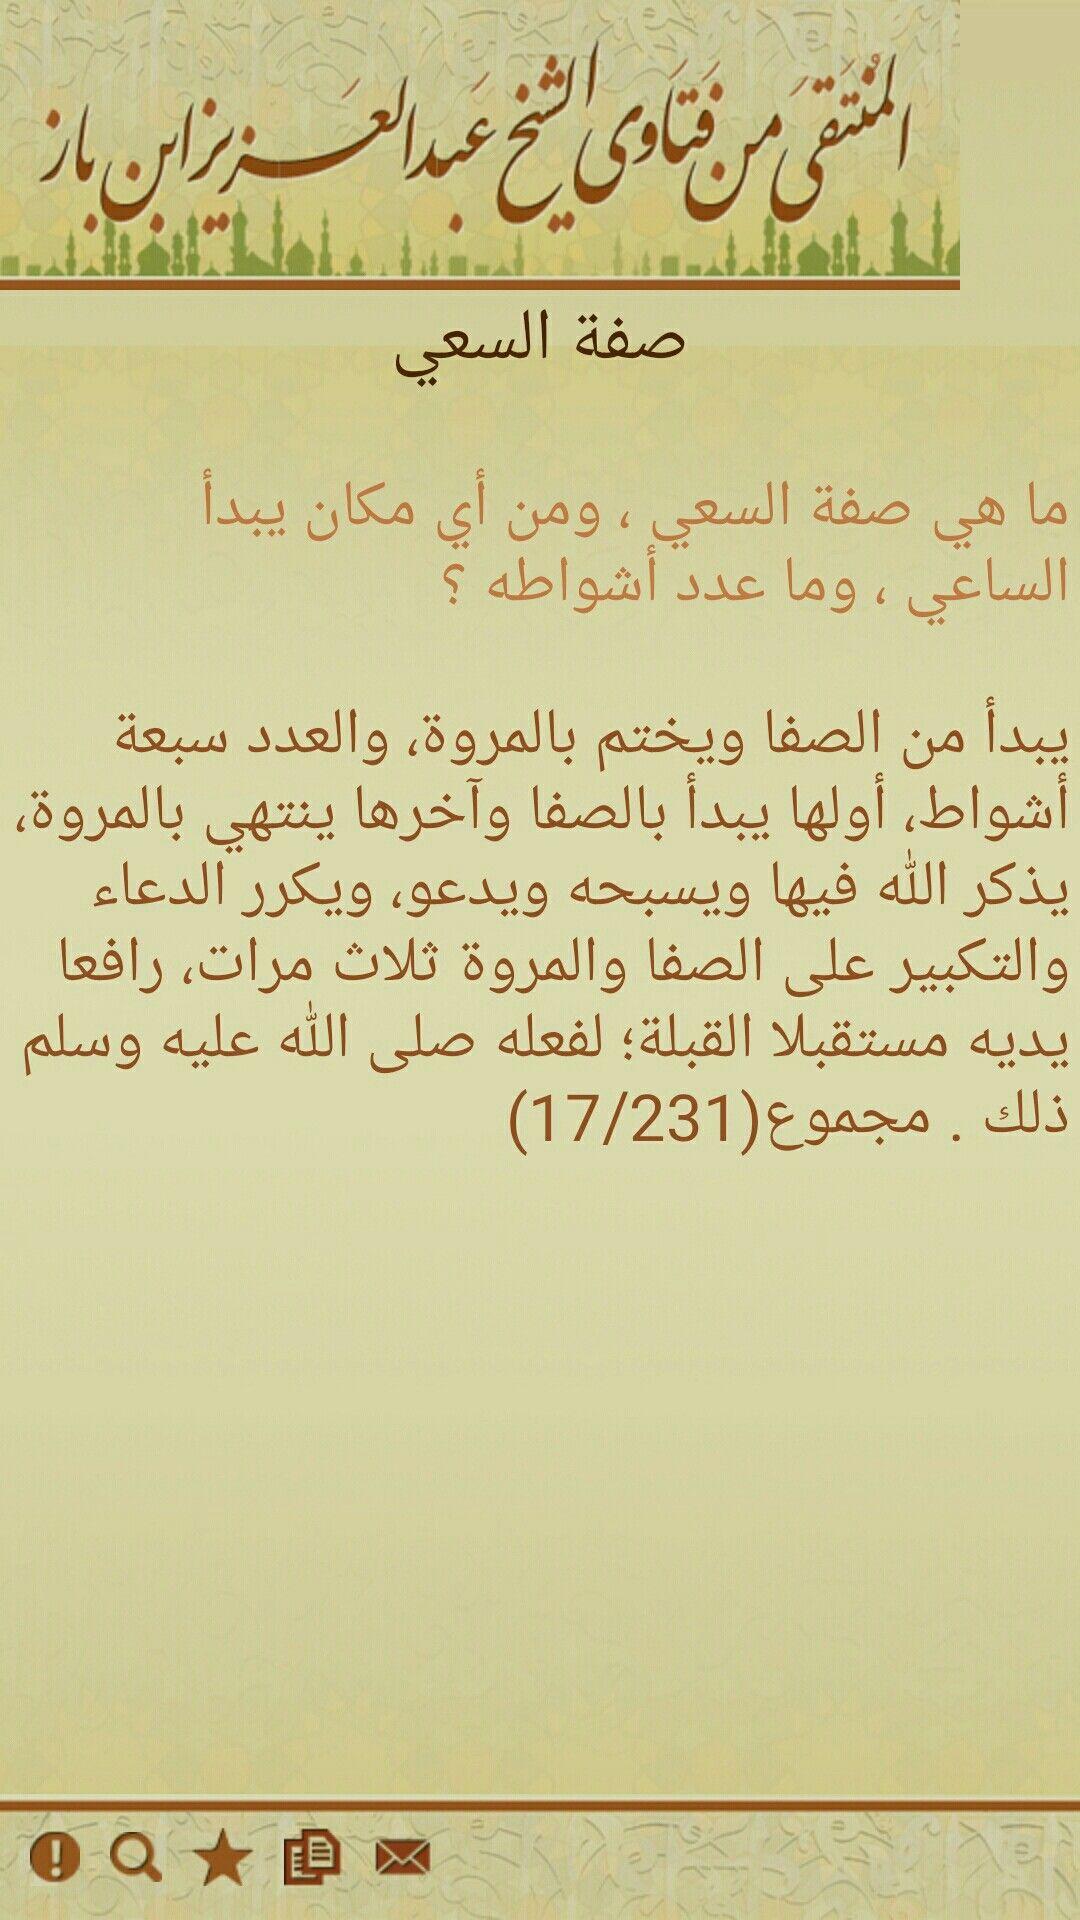 Pin By العلم الشرعي بين يديك أبوعبدال On العلم الشرعي توحيد و سنة Arabic Calligraphy Calligraphy Arabic